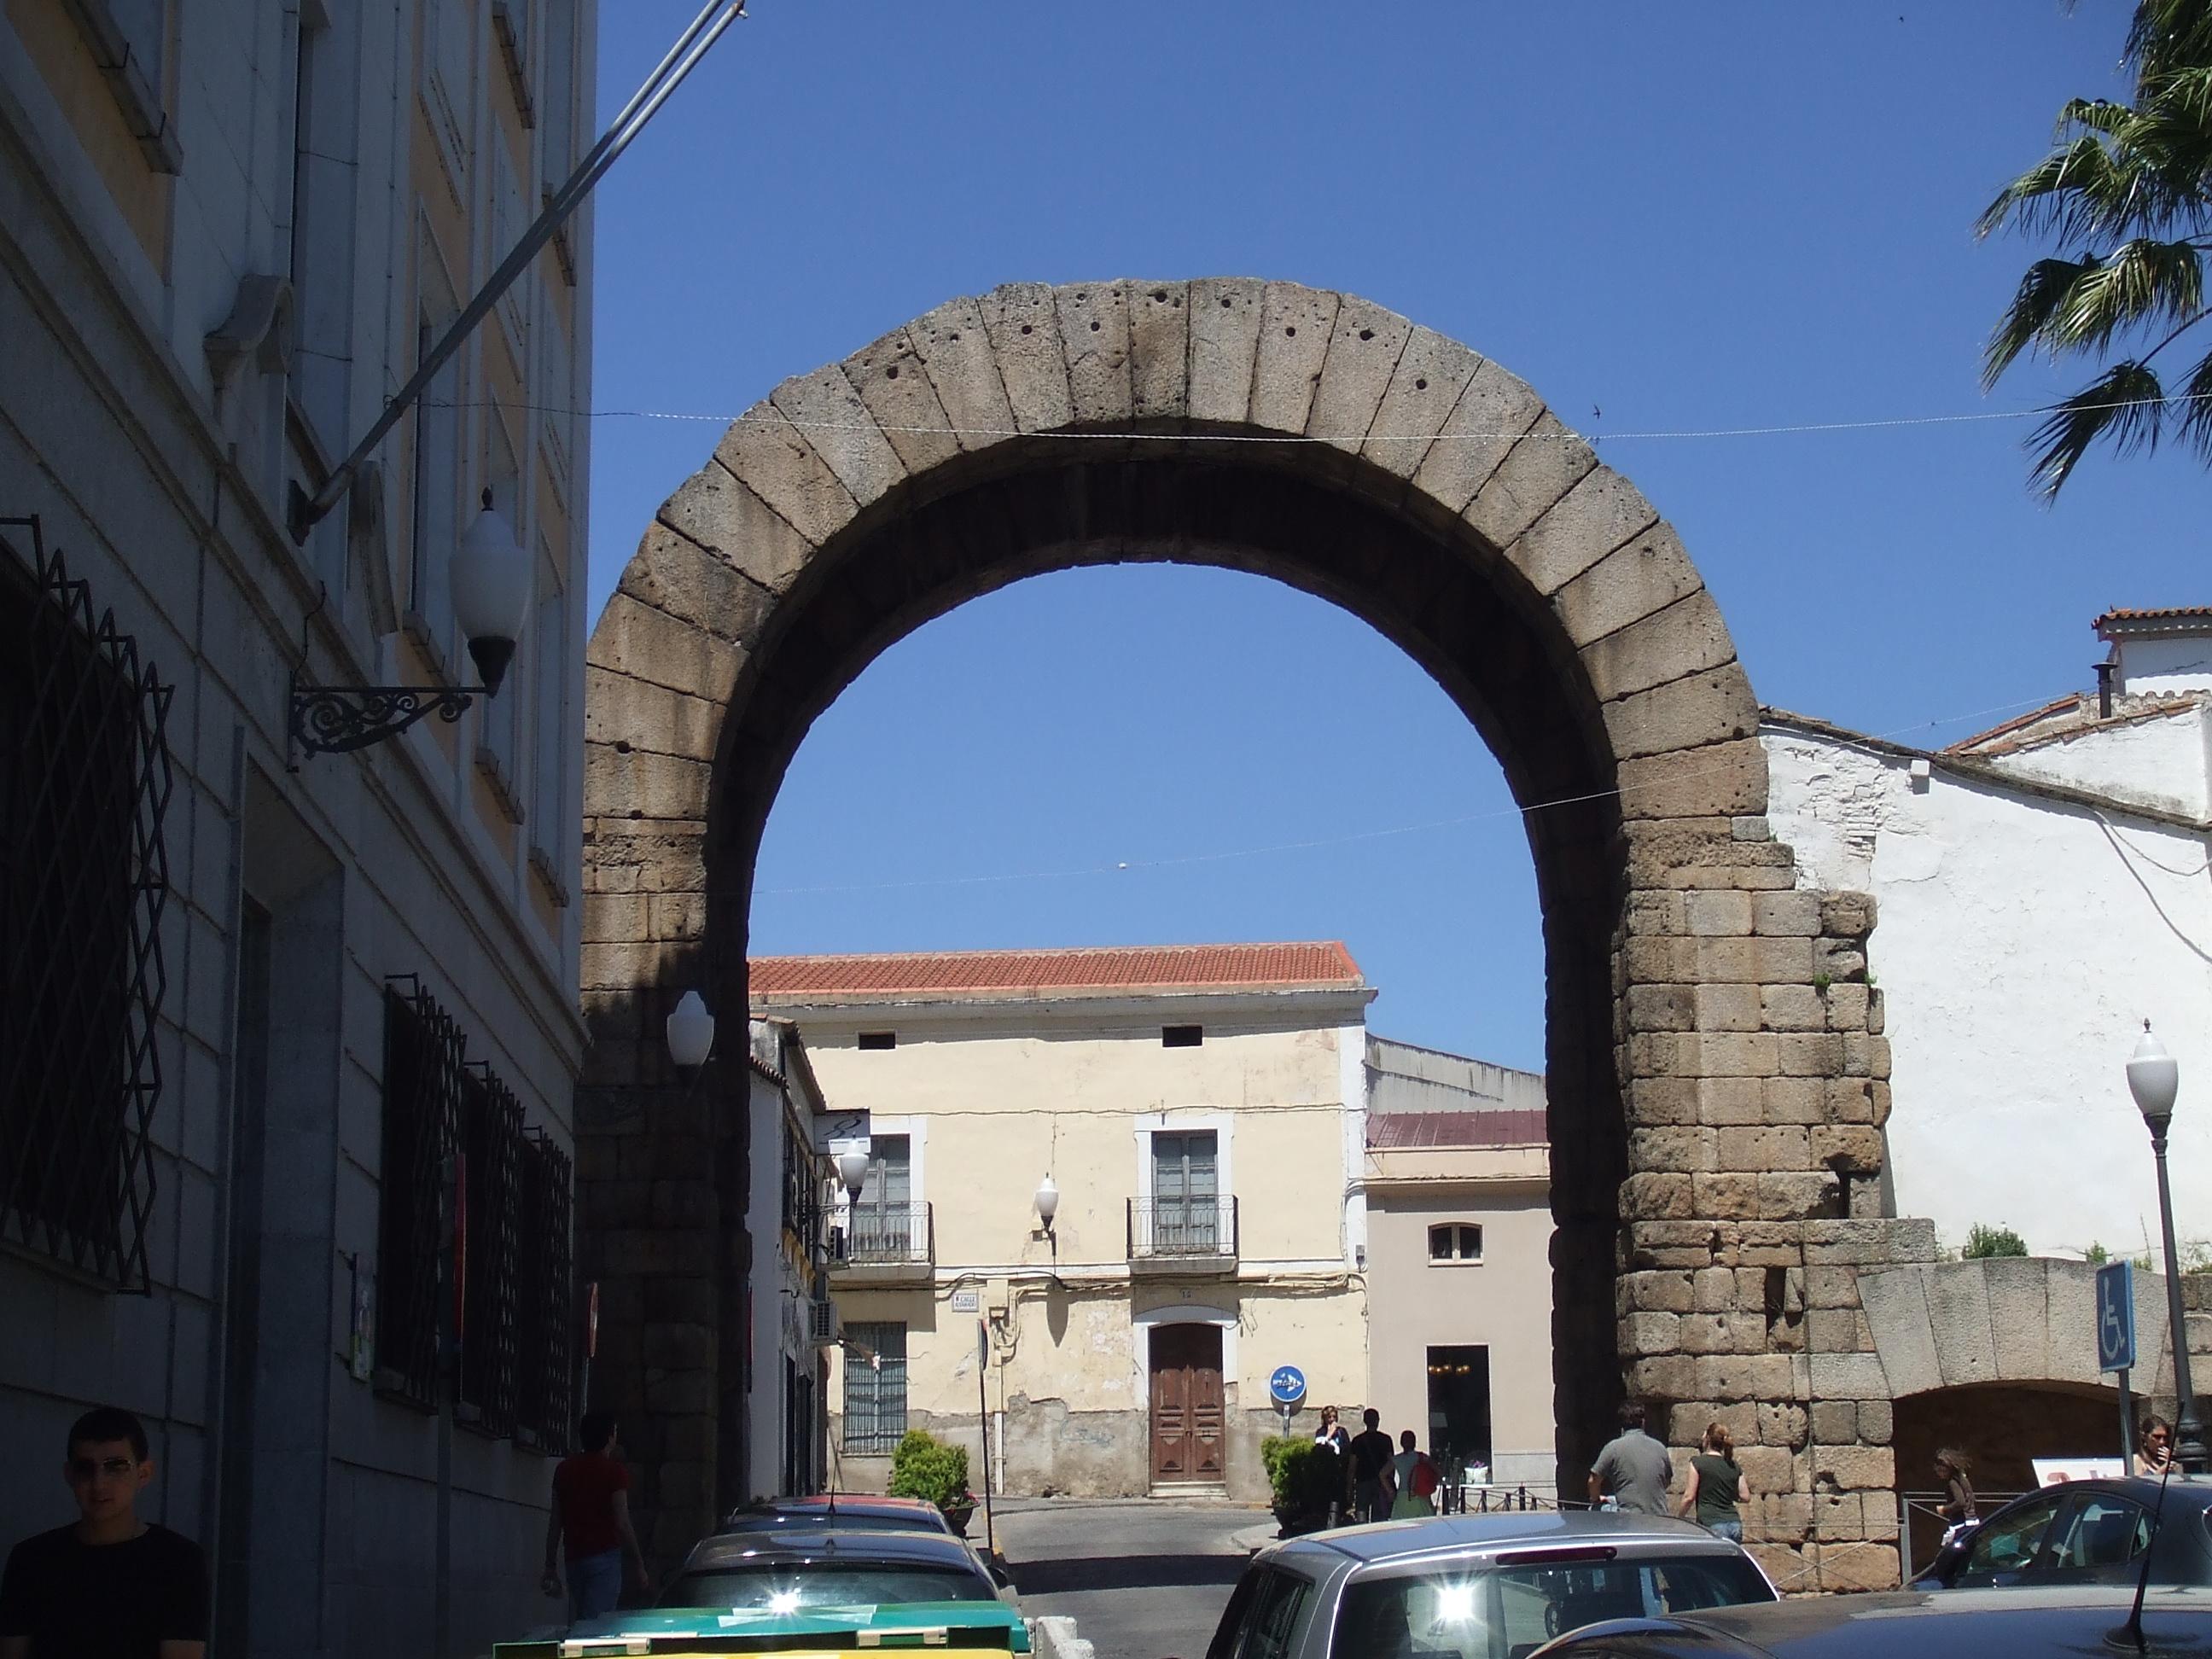 File:Arco de Trajano, Mérida.JPG - Wikimedia Commons